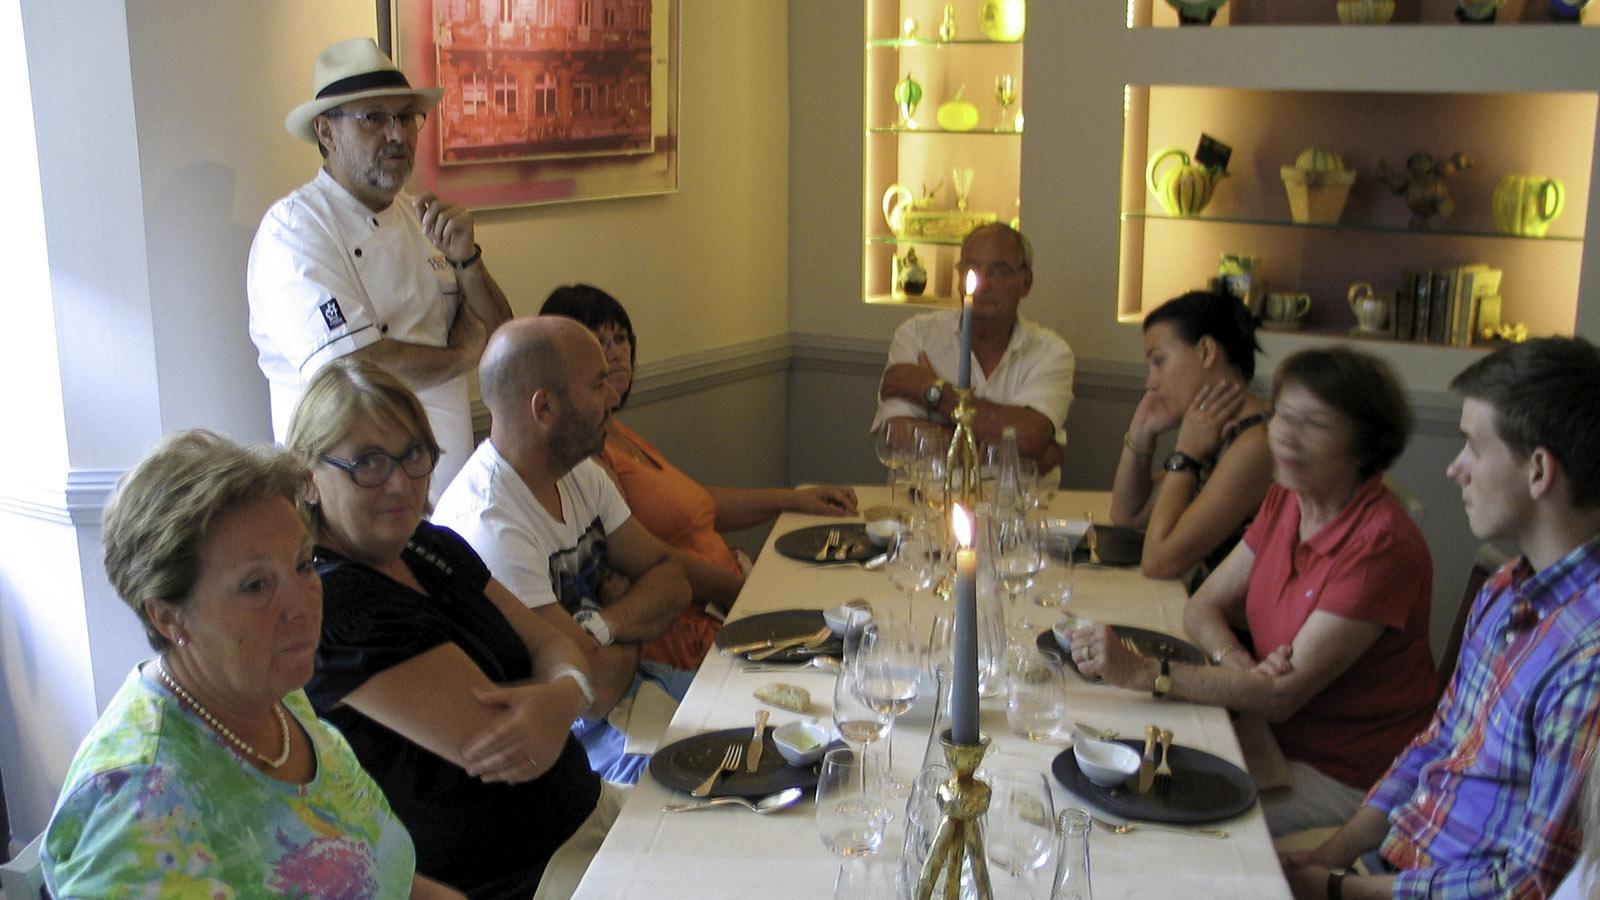 Unser Kochkurs beim Sternekoch Prévot. Foto: Karl-Heinz Stabel